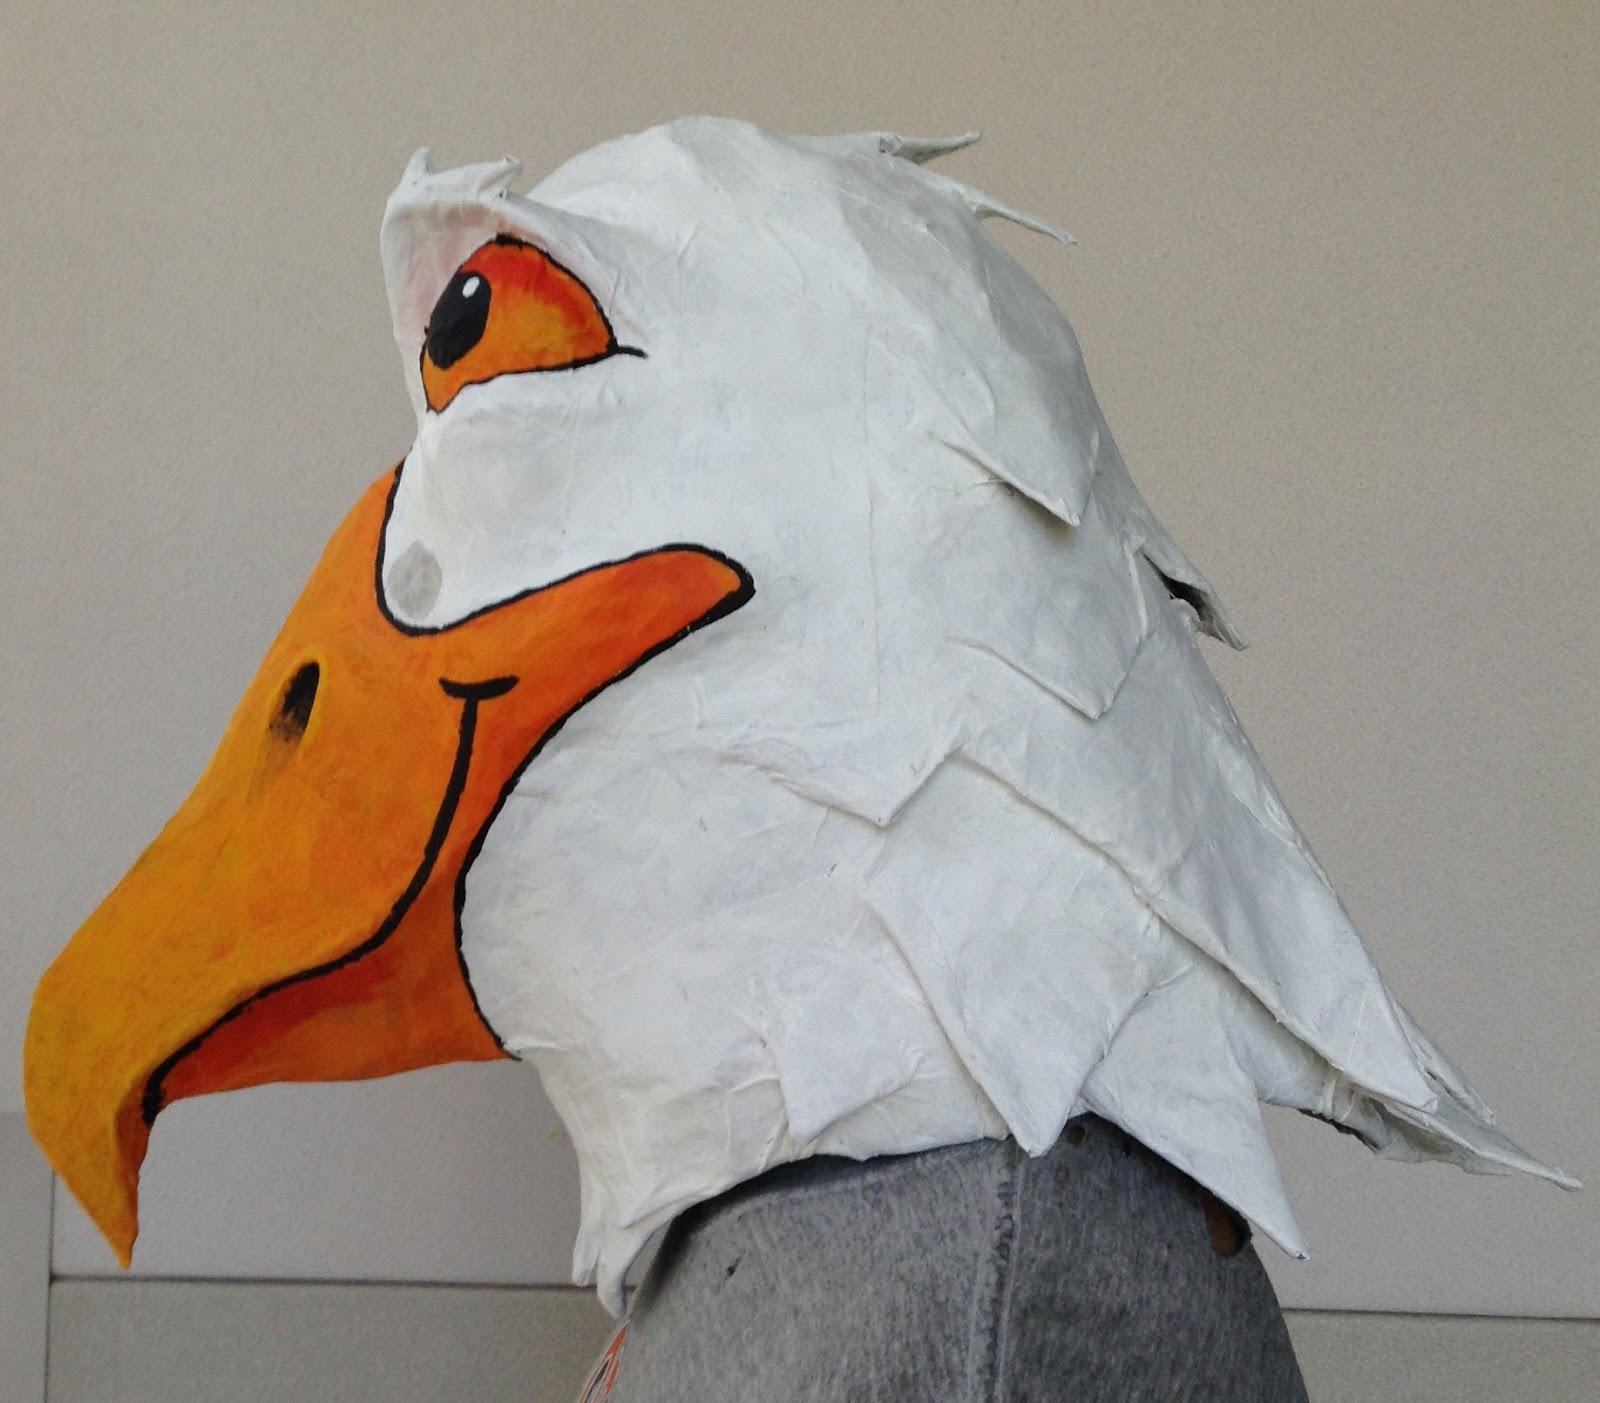 14er art   how to make a paper mache eagle mask